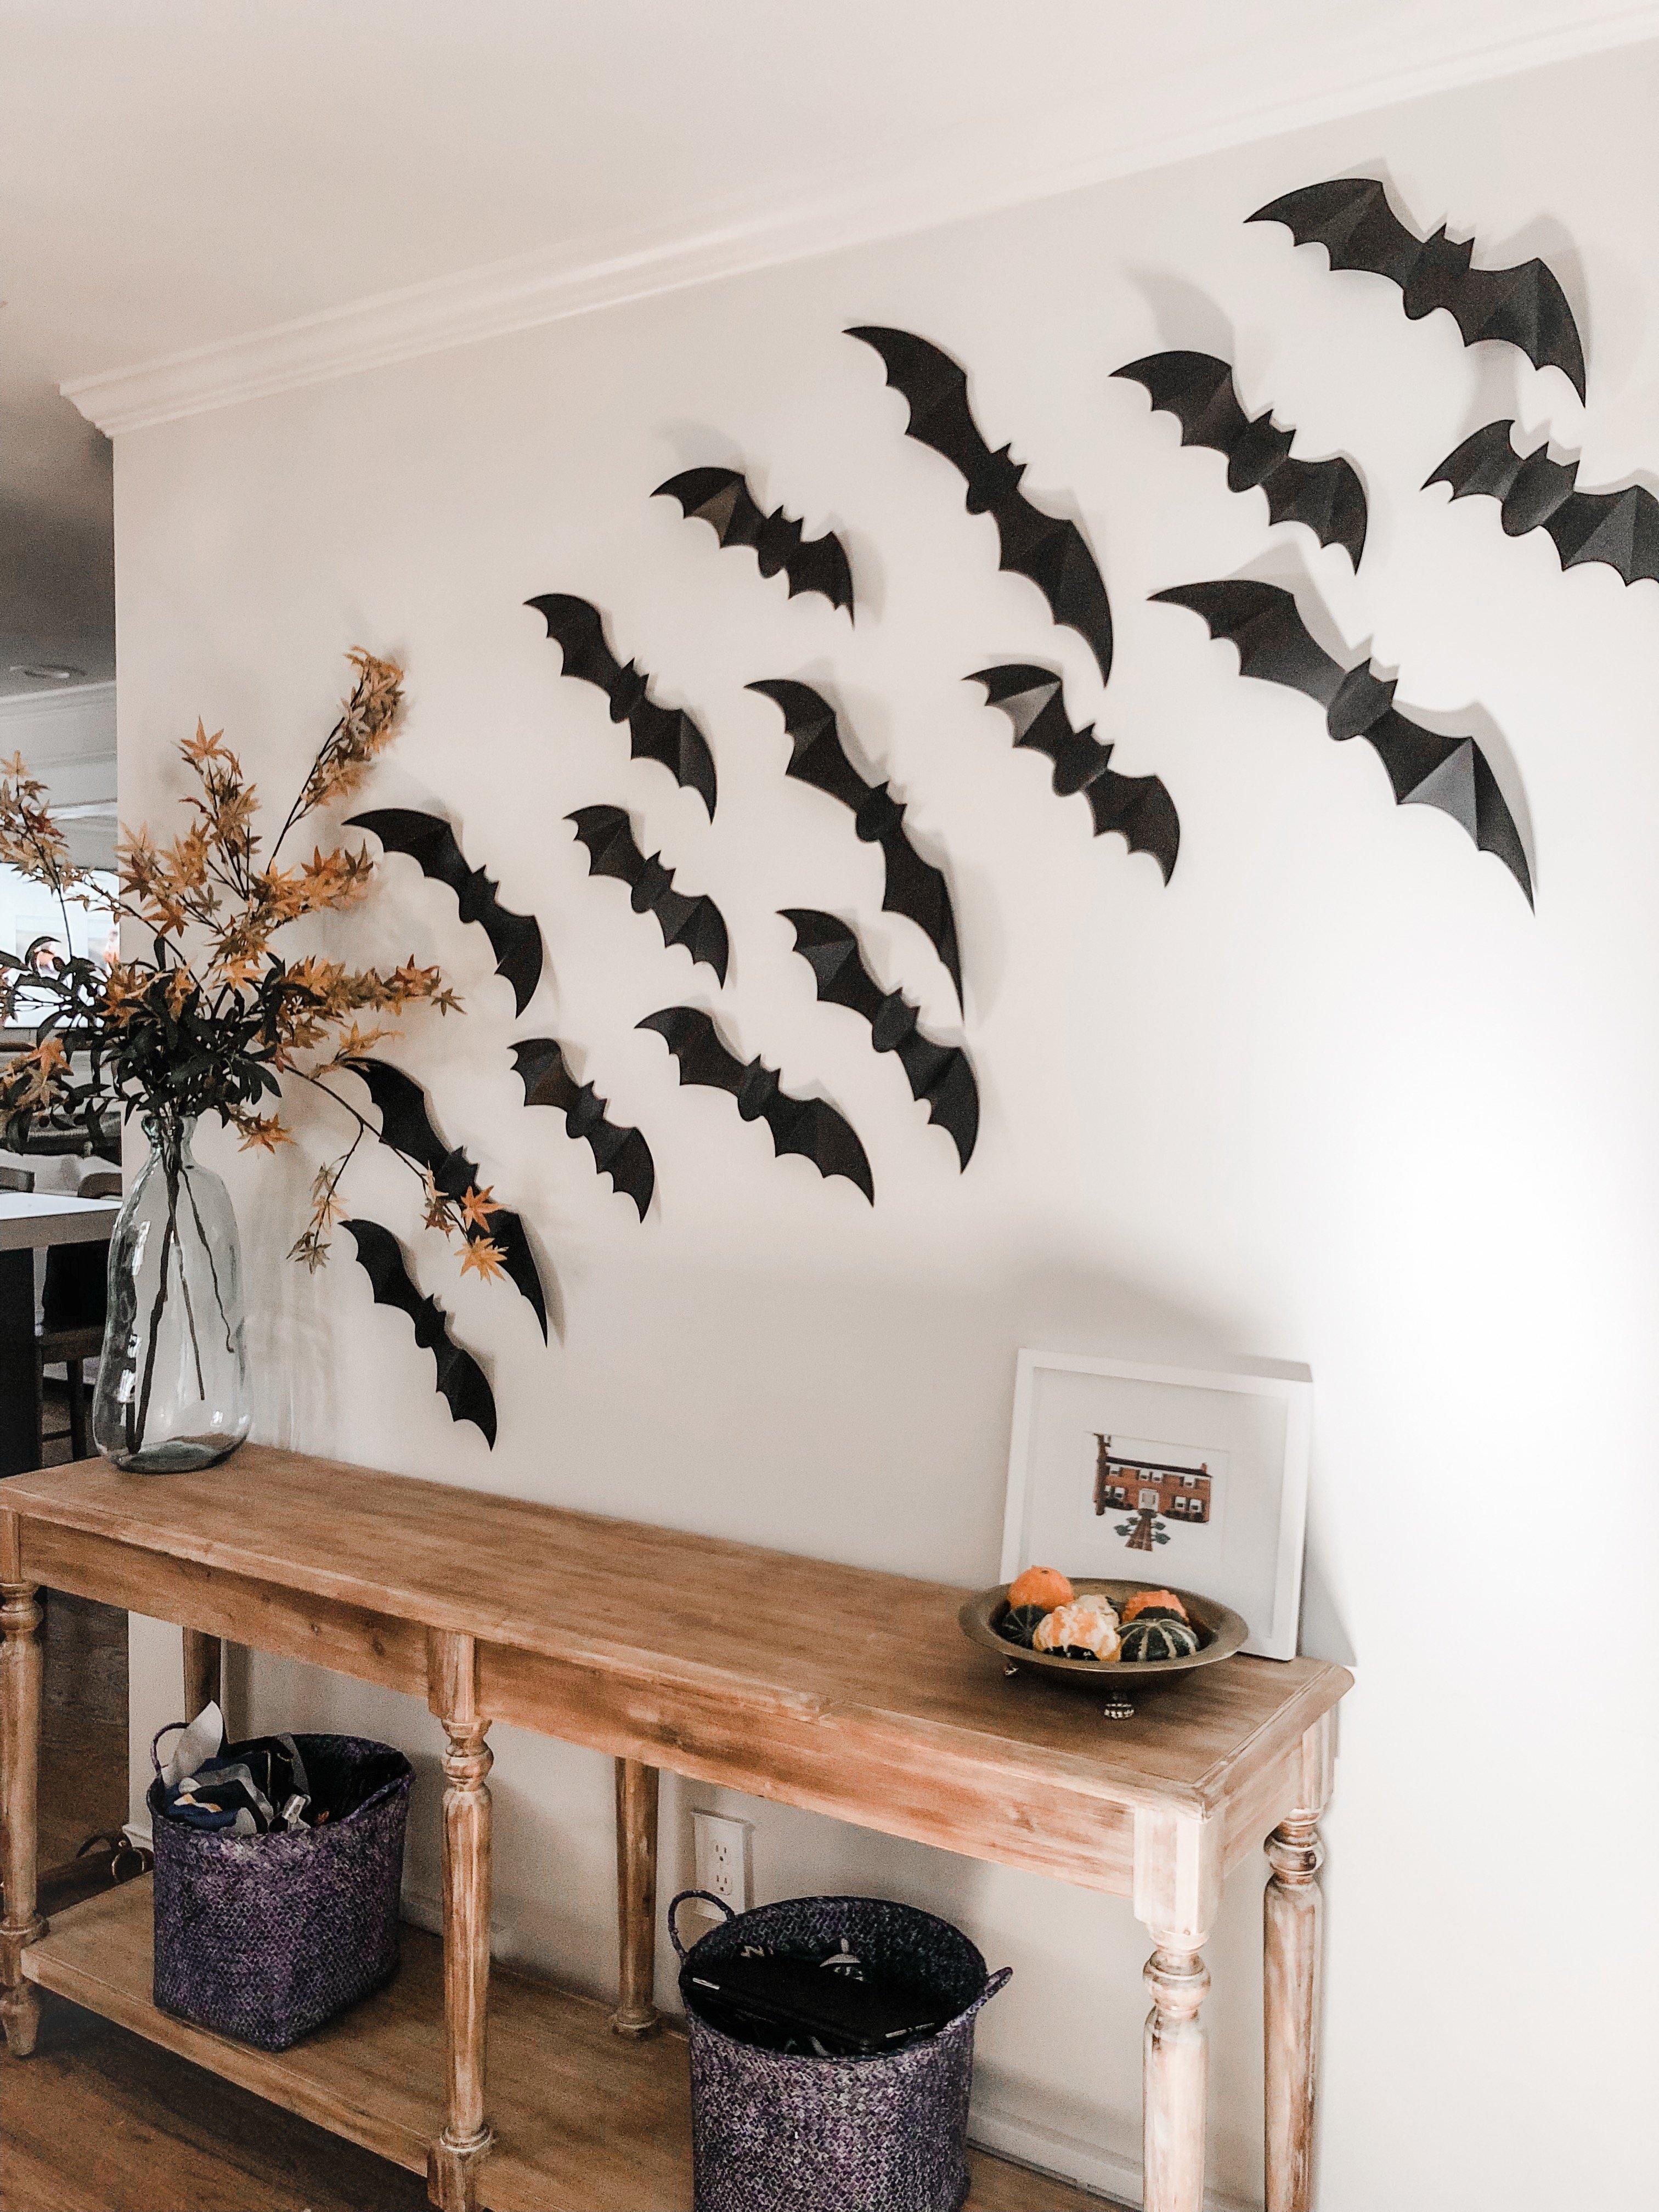 bat wall decor for Halloween